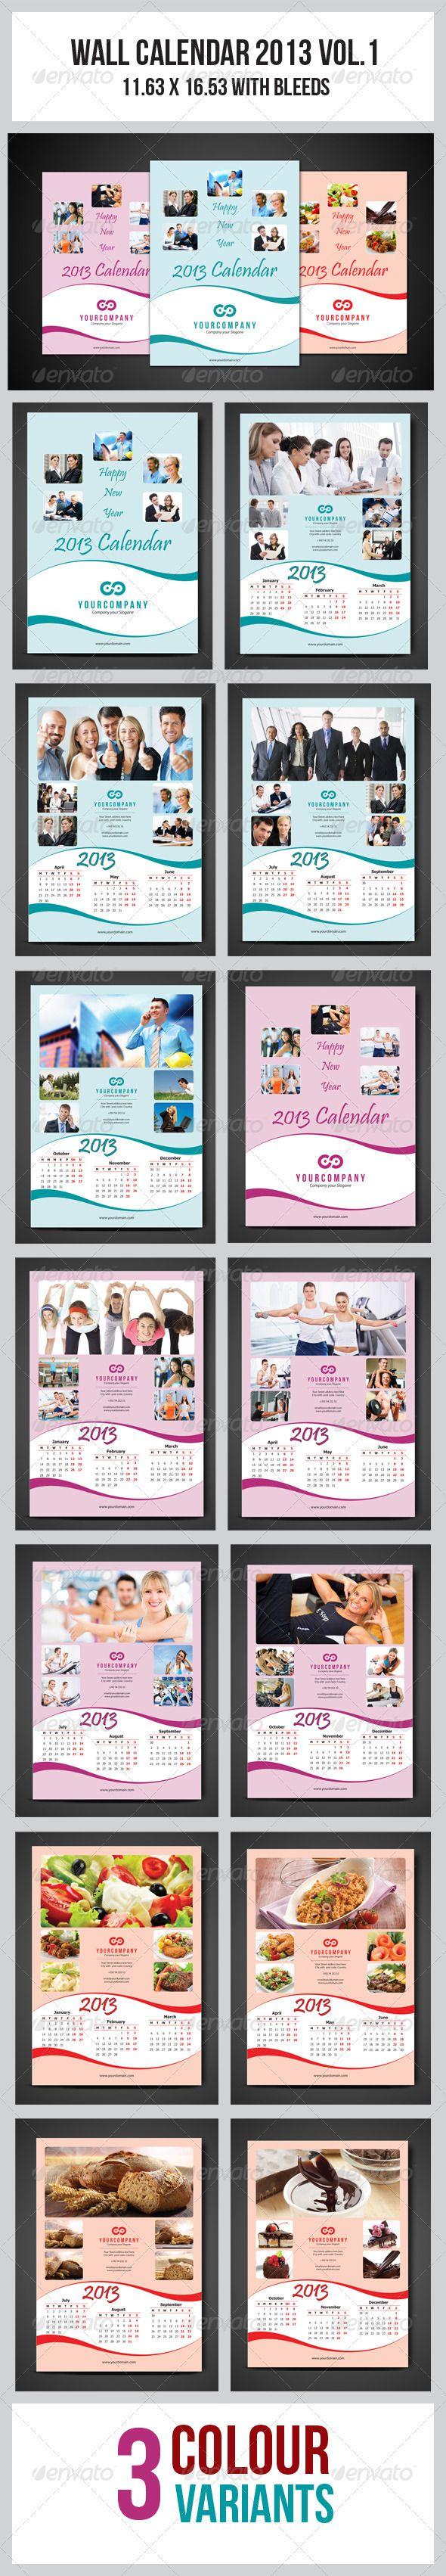 Calendar Design Letters : Best images about corporate calendar design on